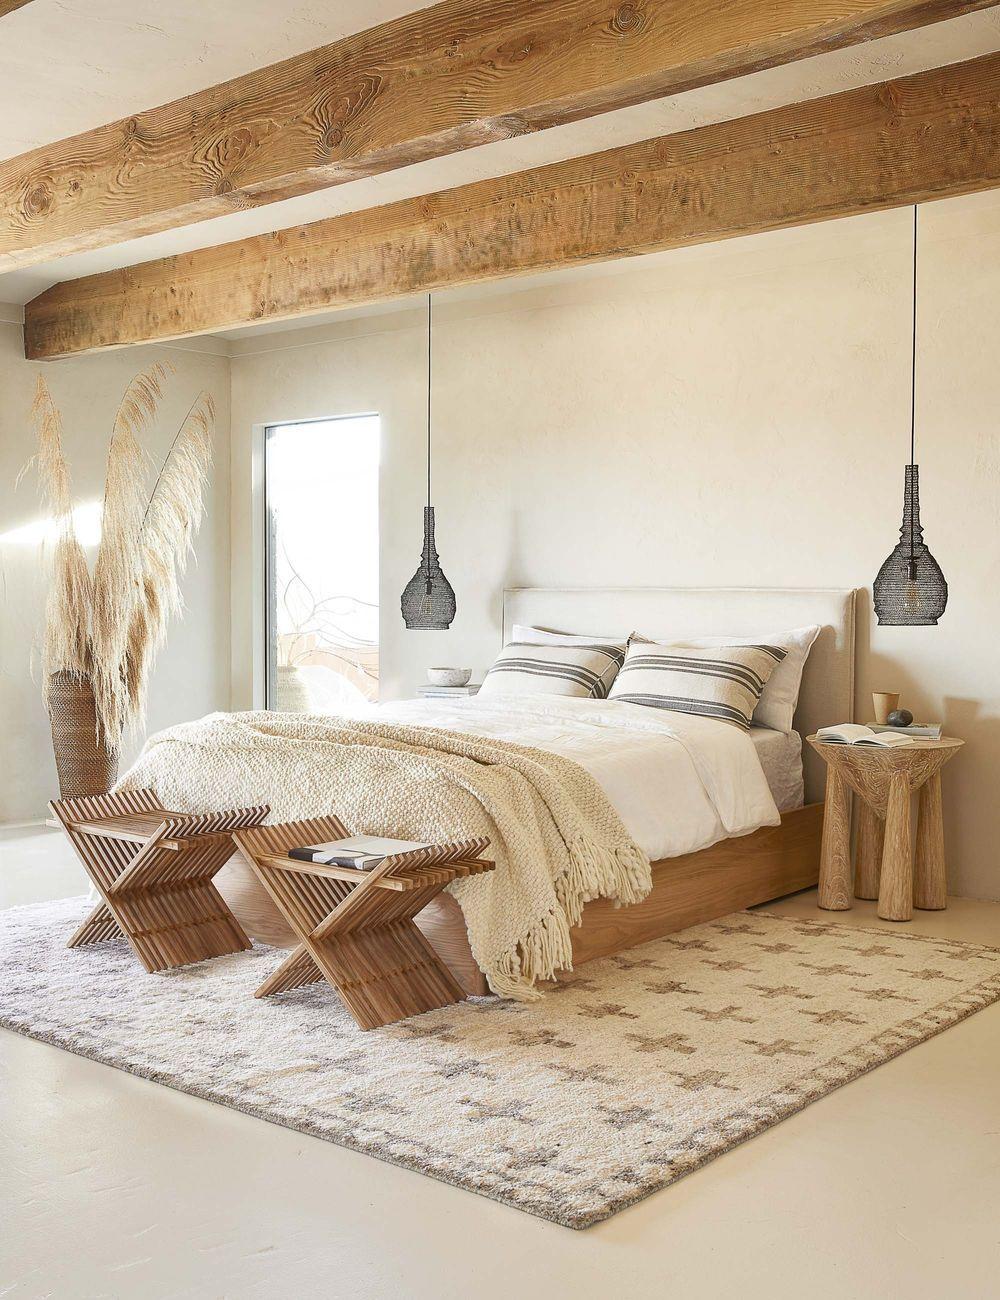 13 Easy Ways To Freshen Room 2020 Pretty Aesthetic Room Ideas